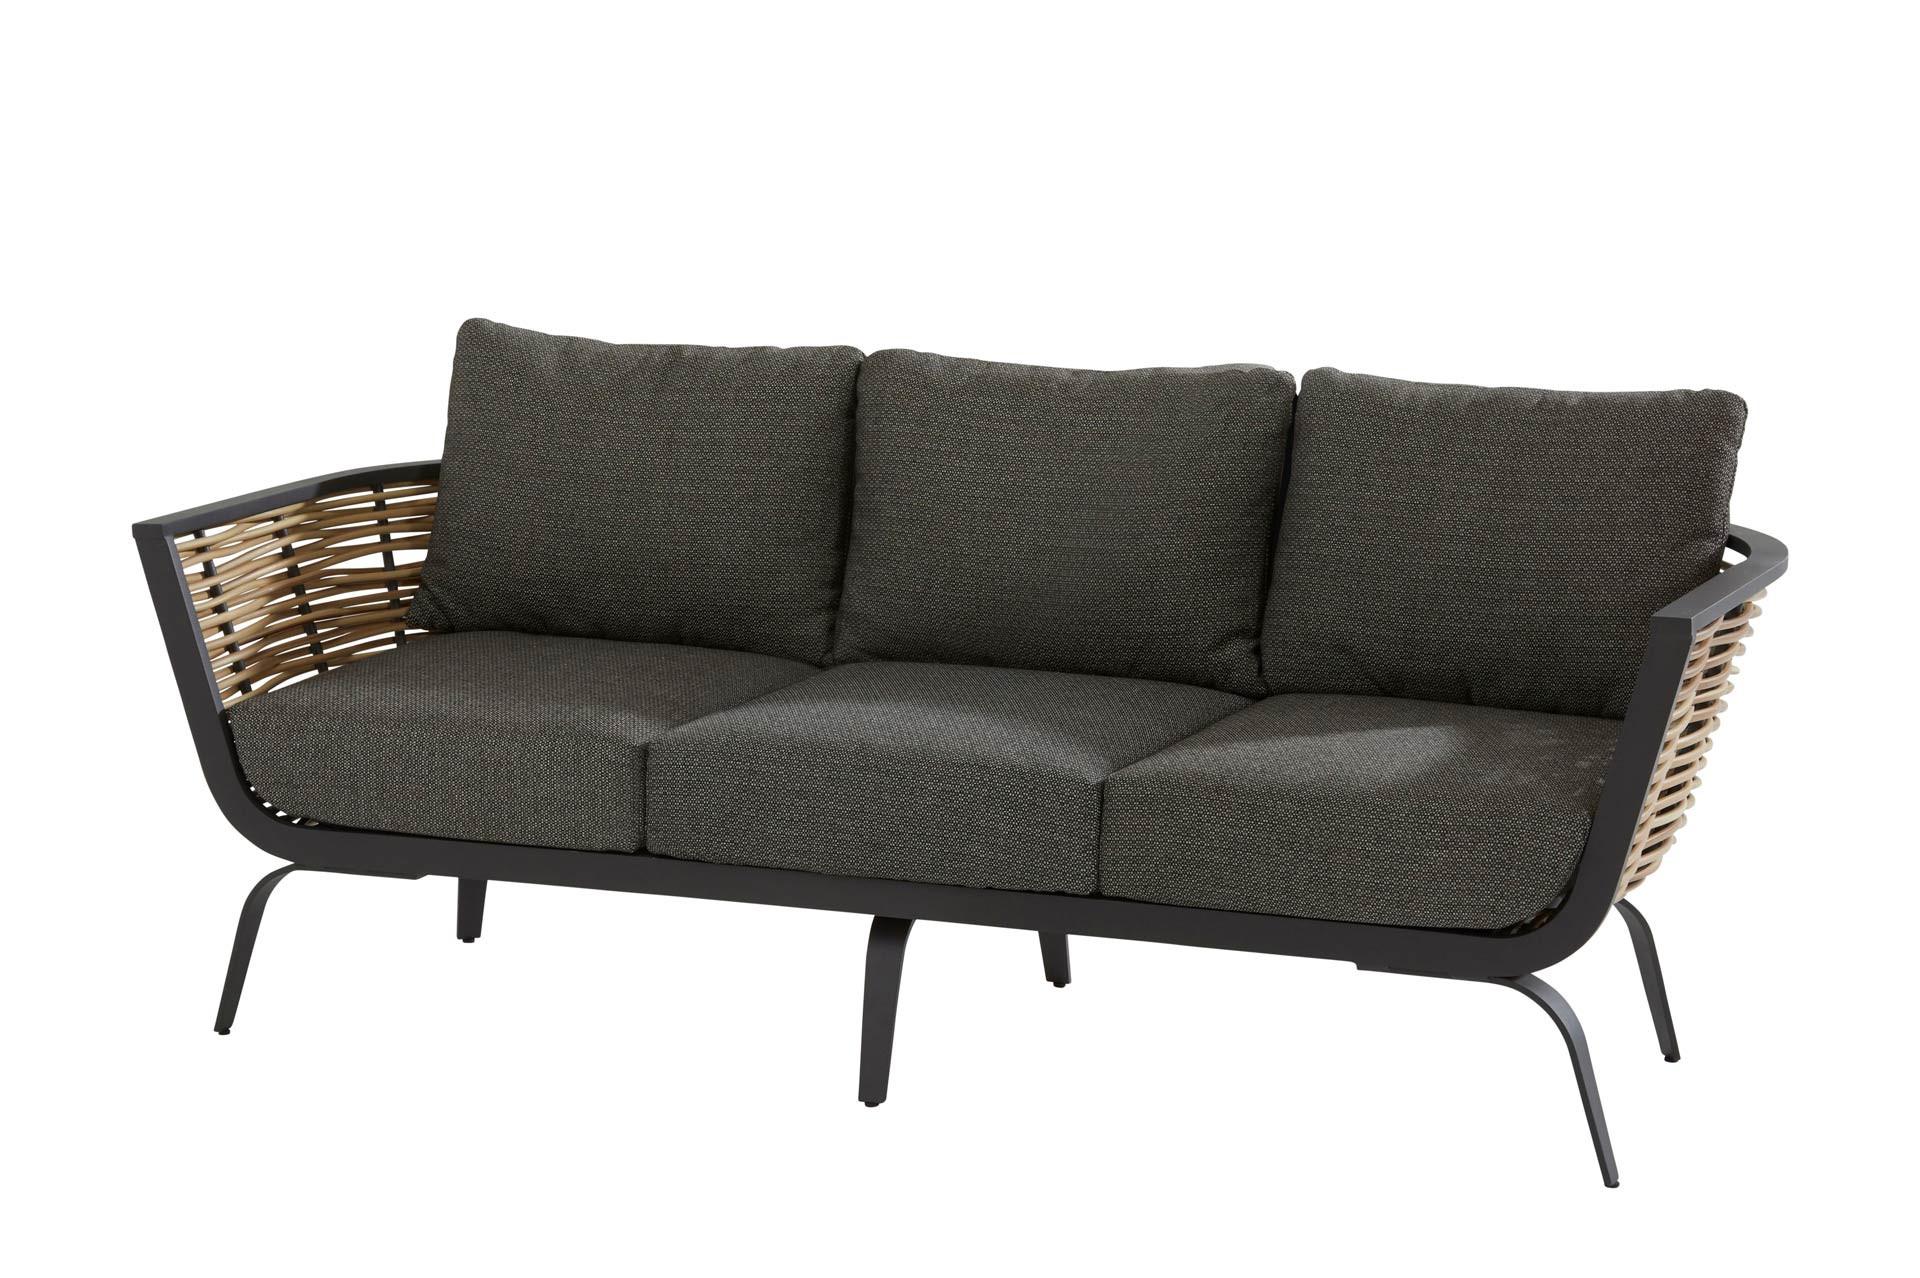 Antibes 3-Sitzer Bank 2 Arme mit 6 Kissen